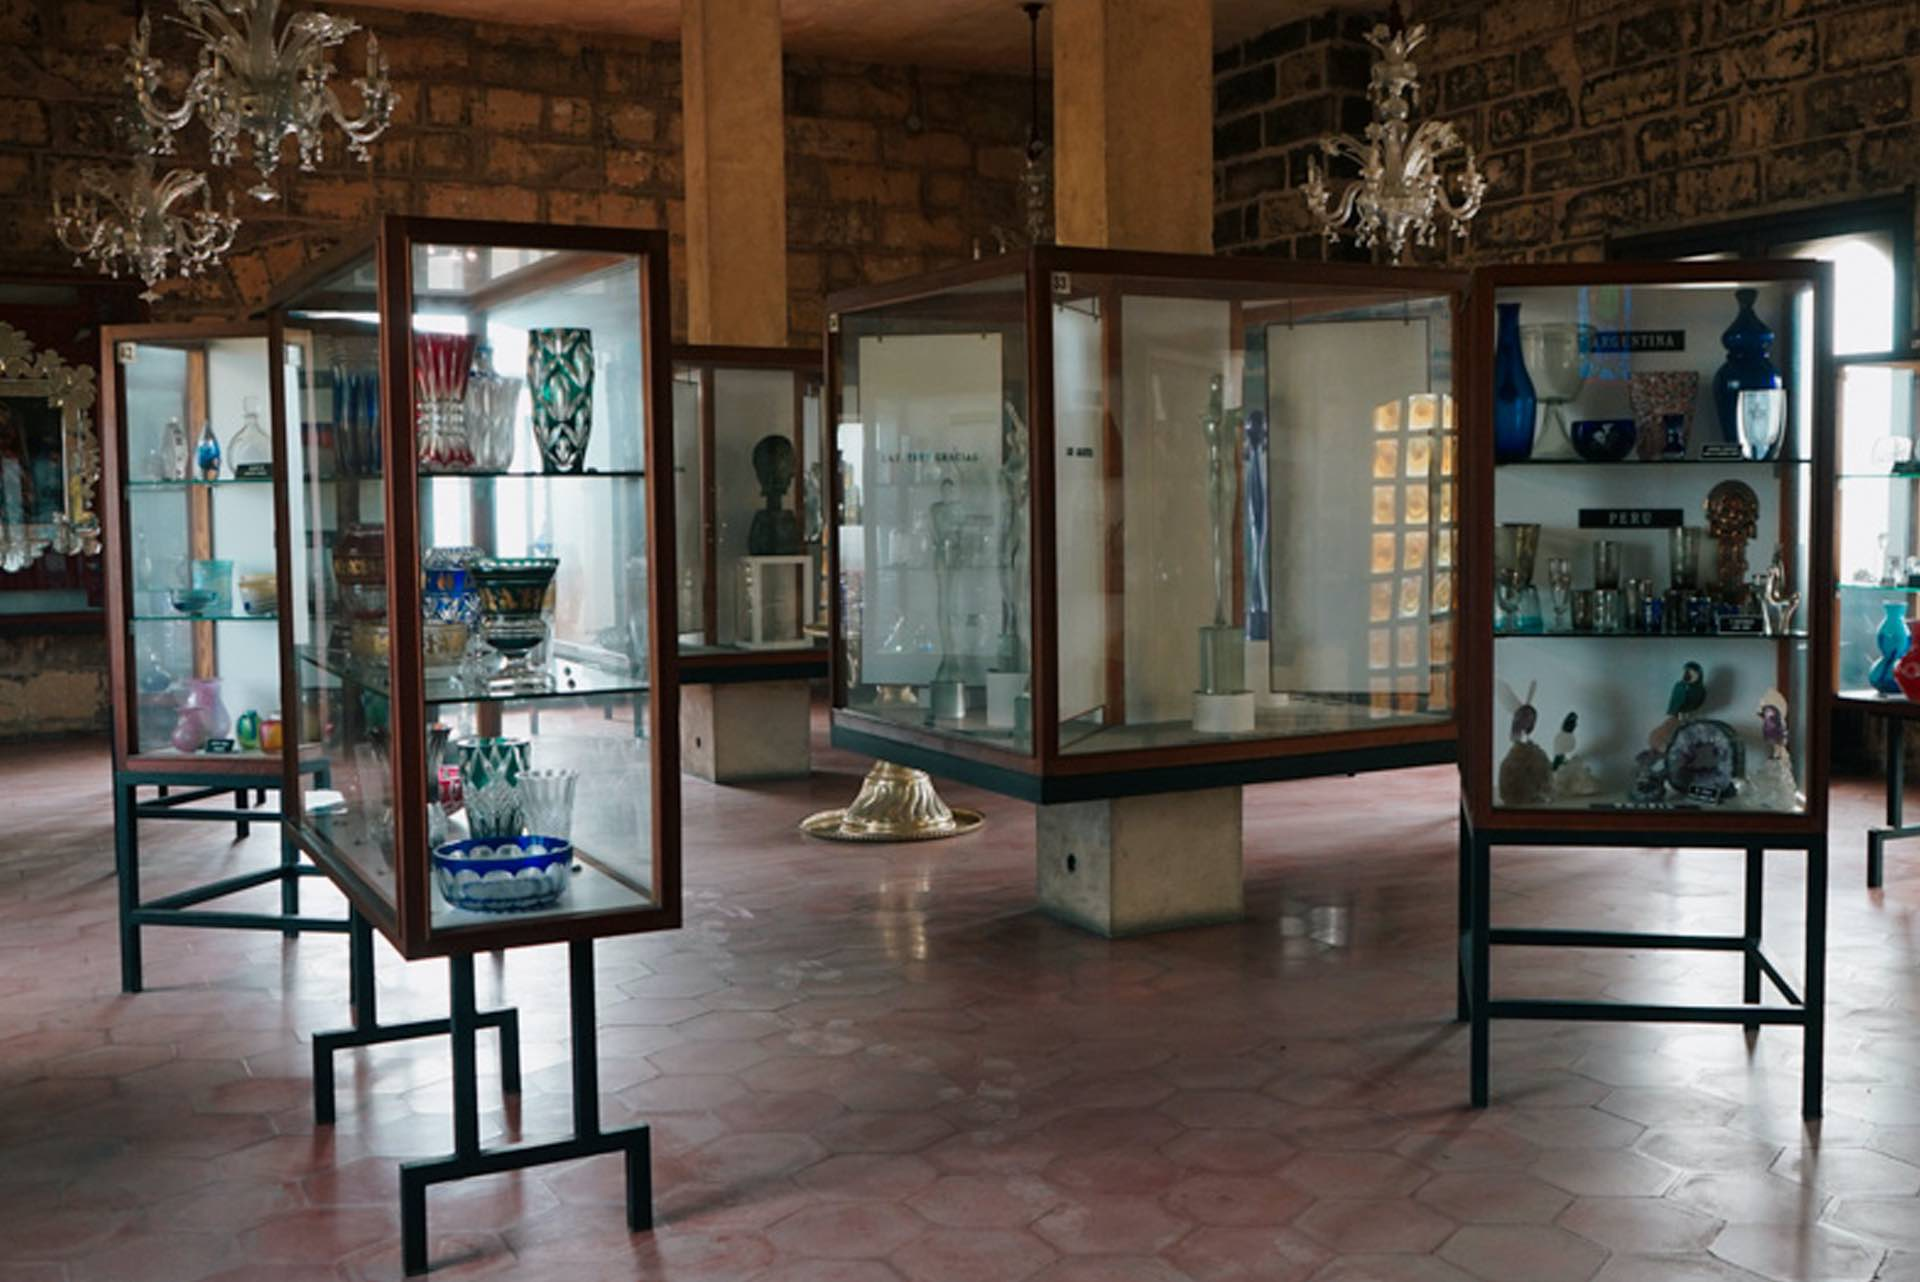 vidrio-soplado-gordiola-museo-sala-mundo